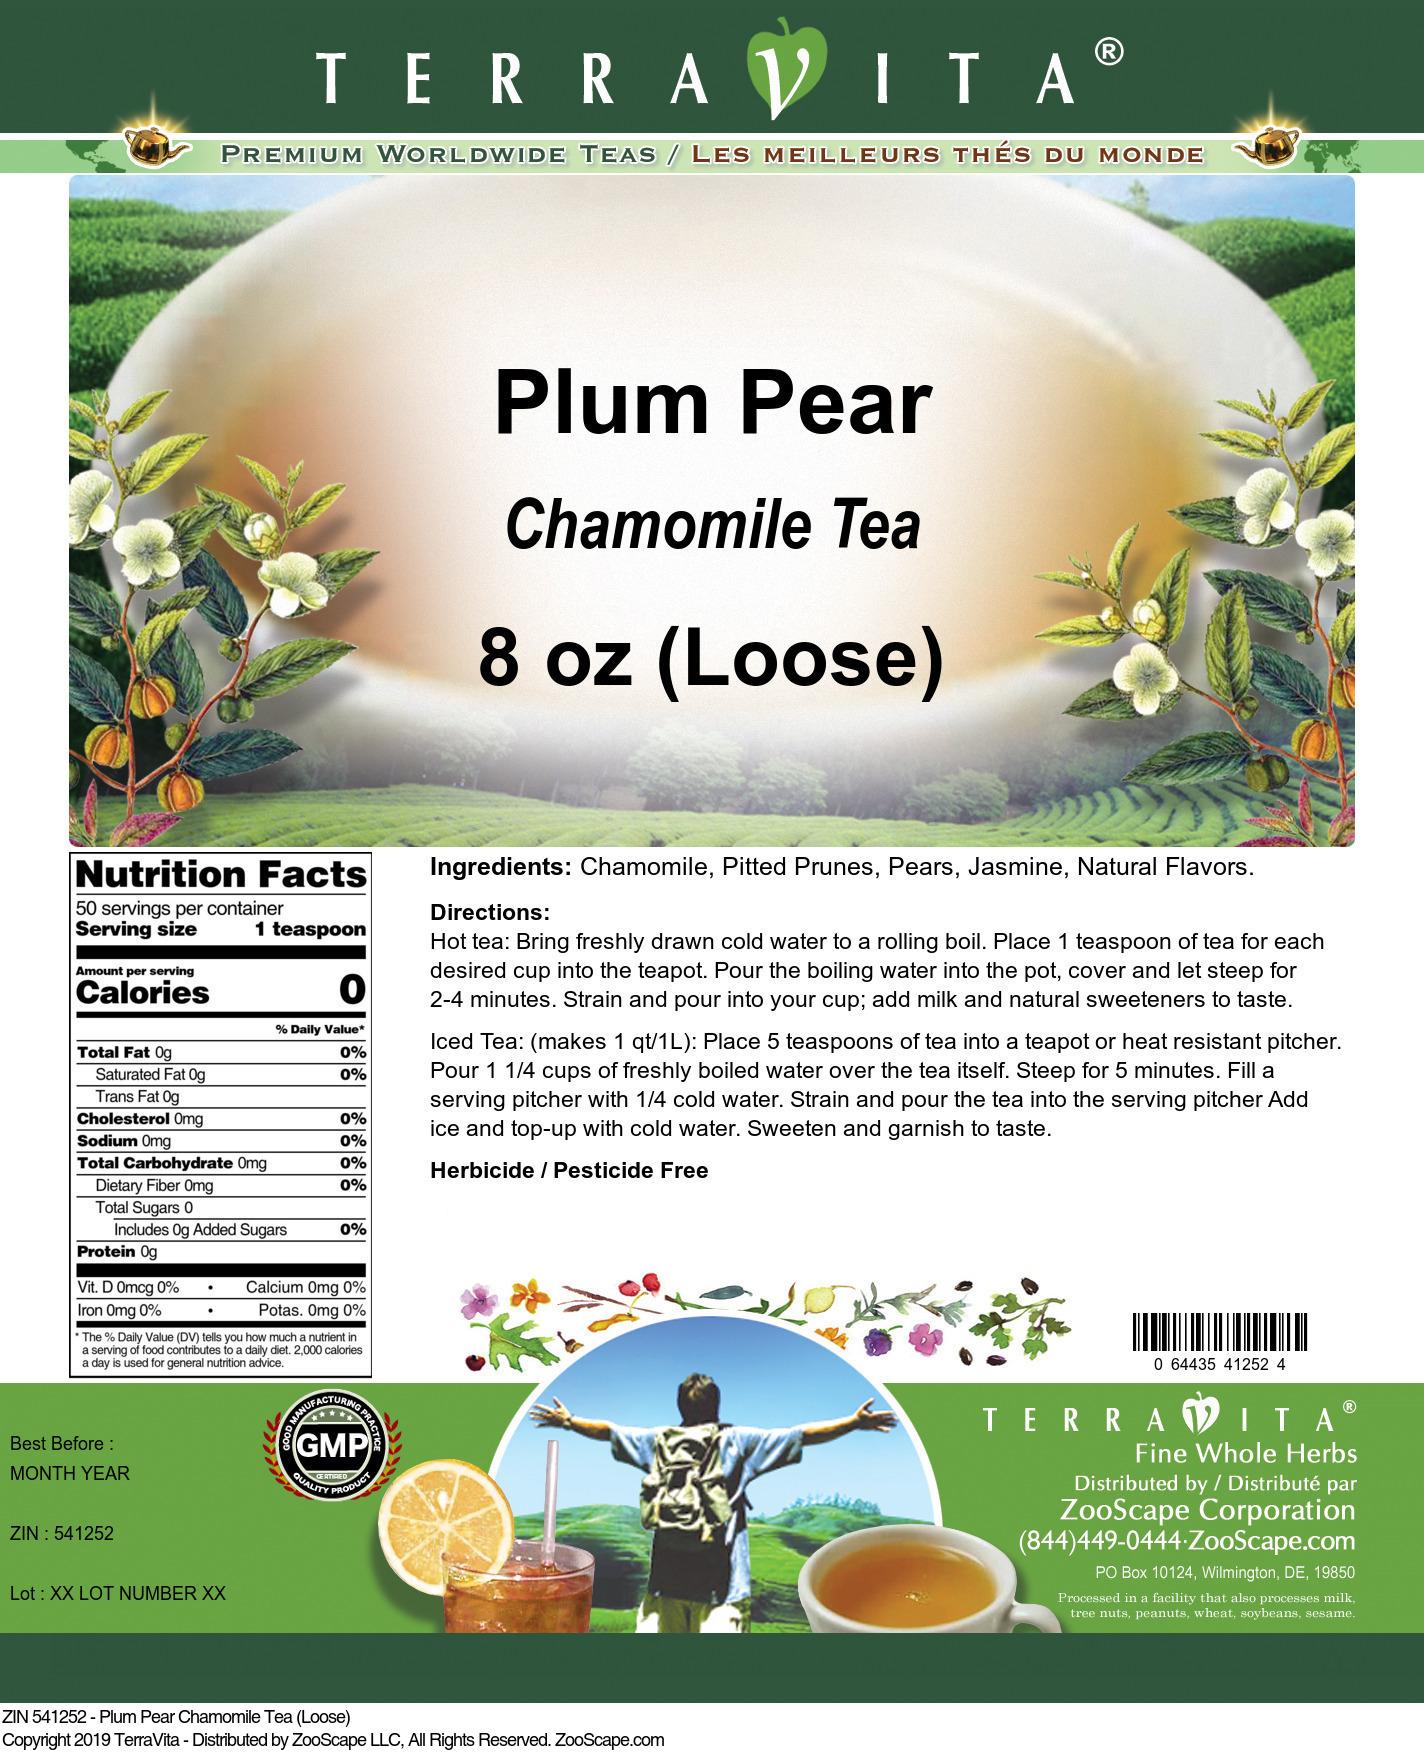 Plum Pear Chamomile Tea (Loose)